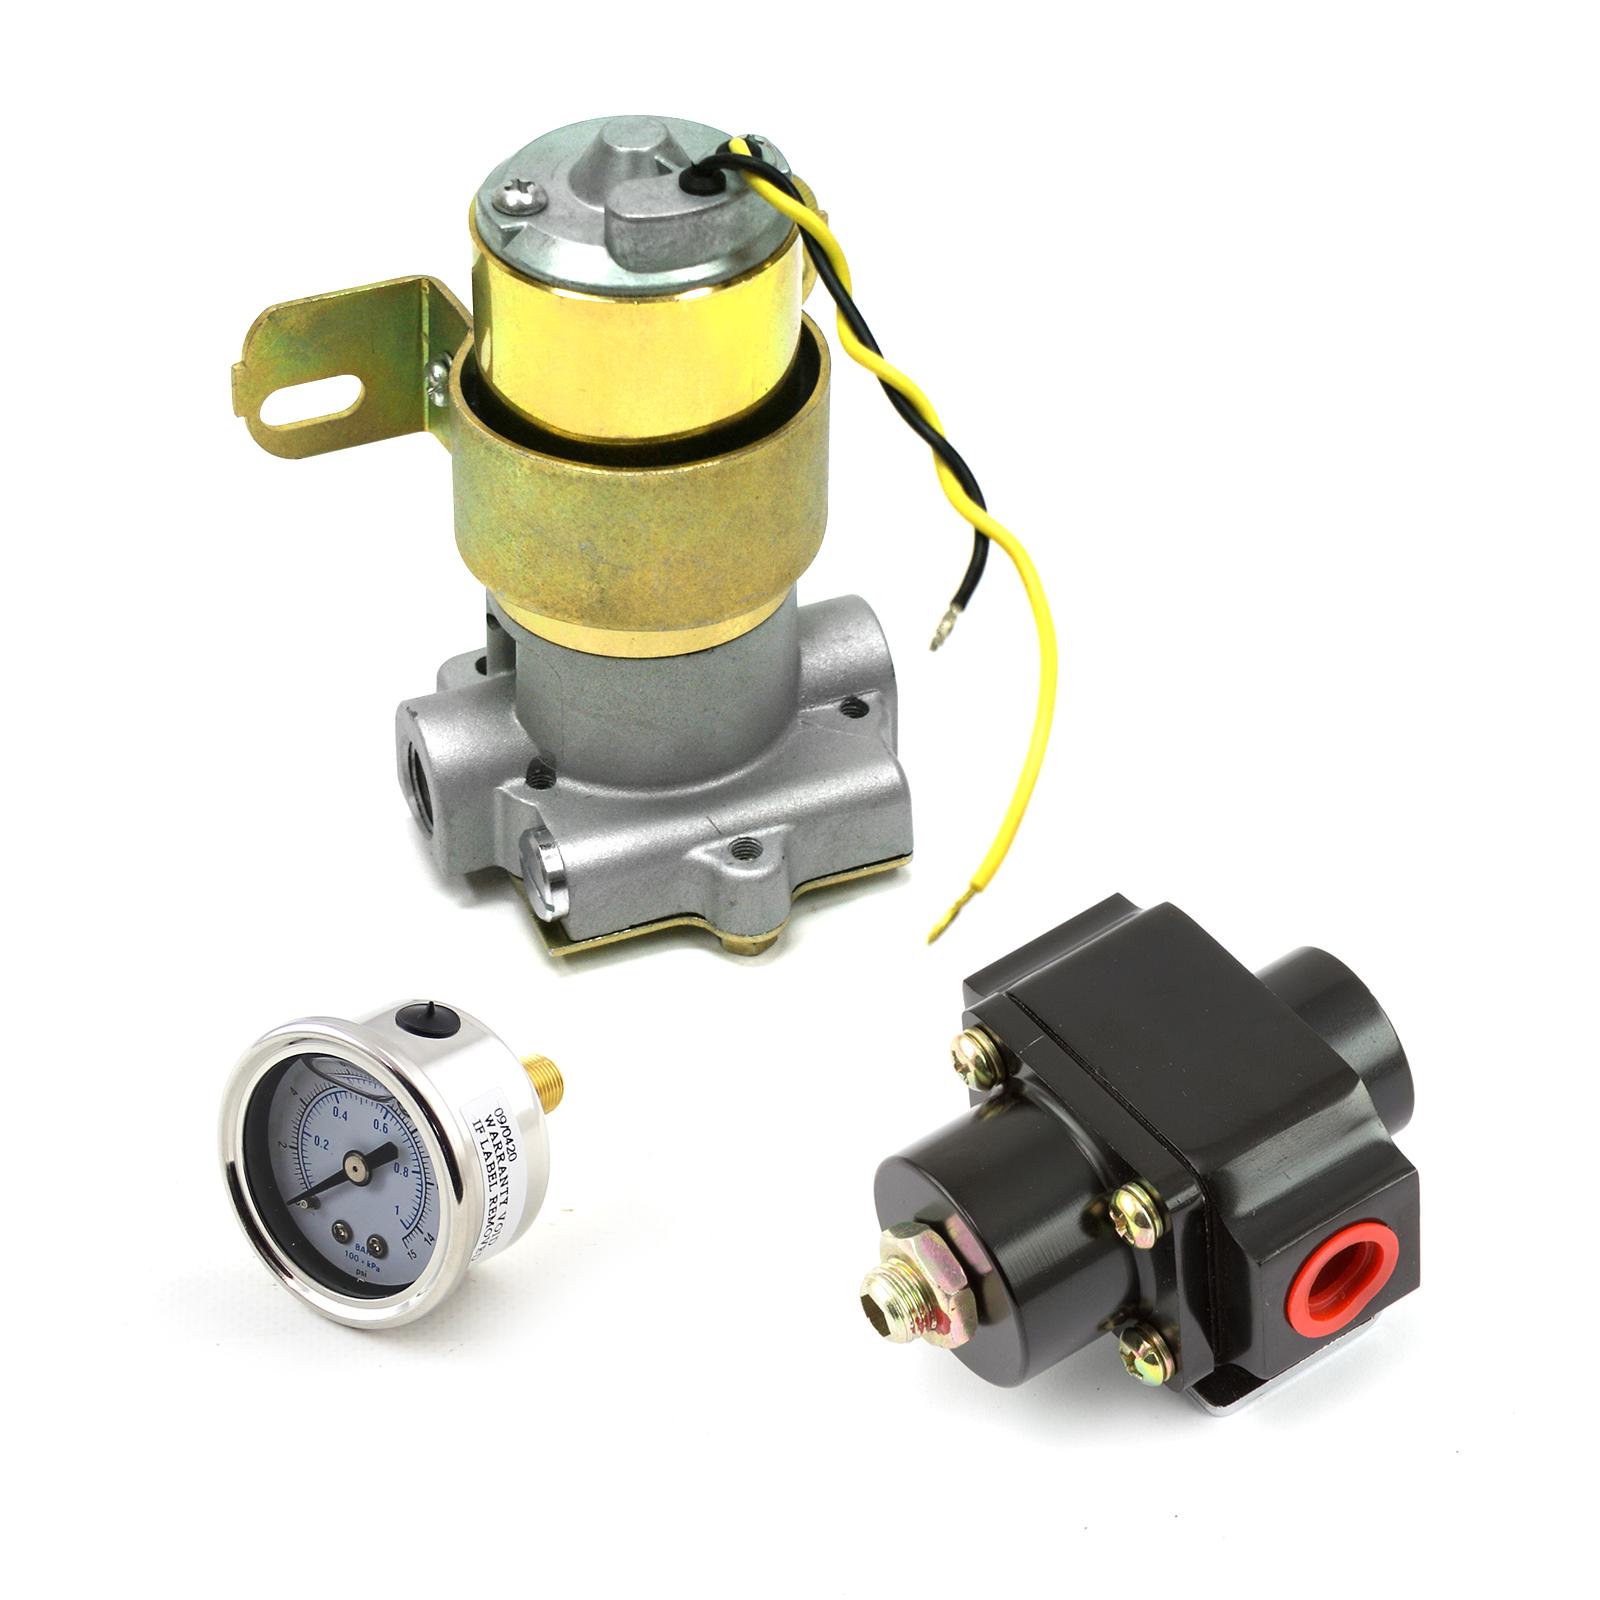 110 Gph Universal Electric Fuel Pump Black Regulator & Gauge Combo Kit